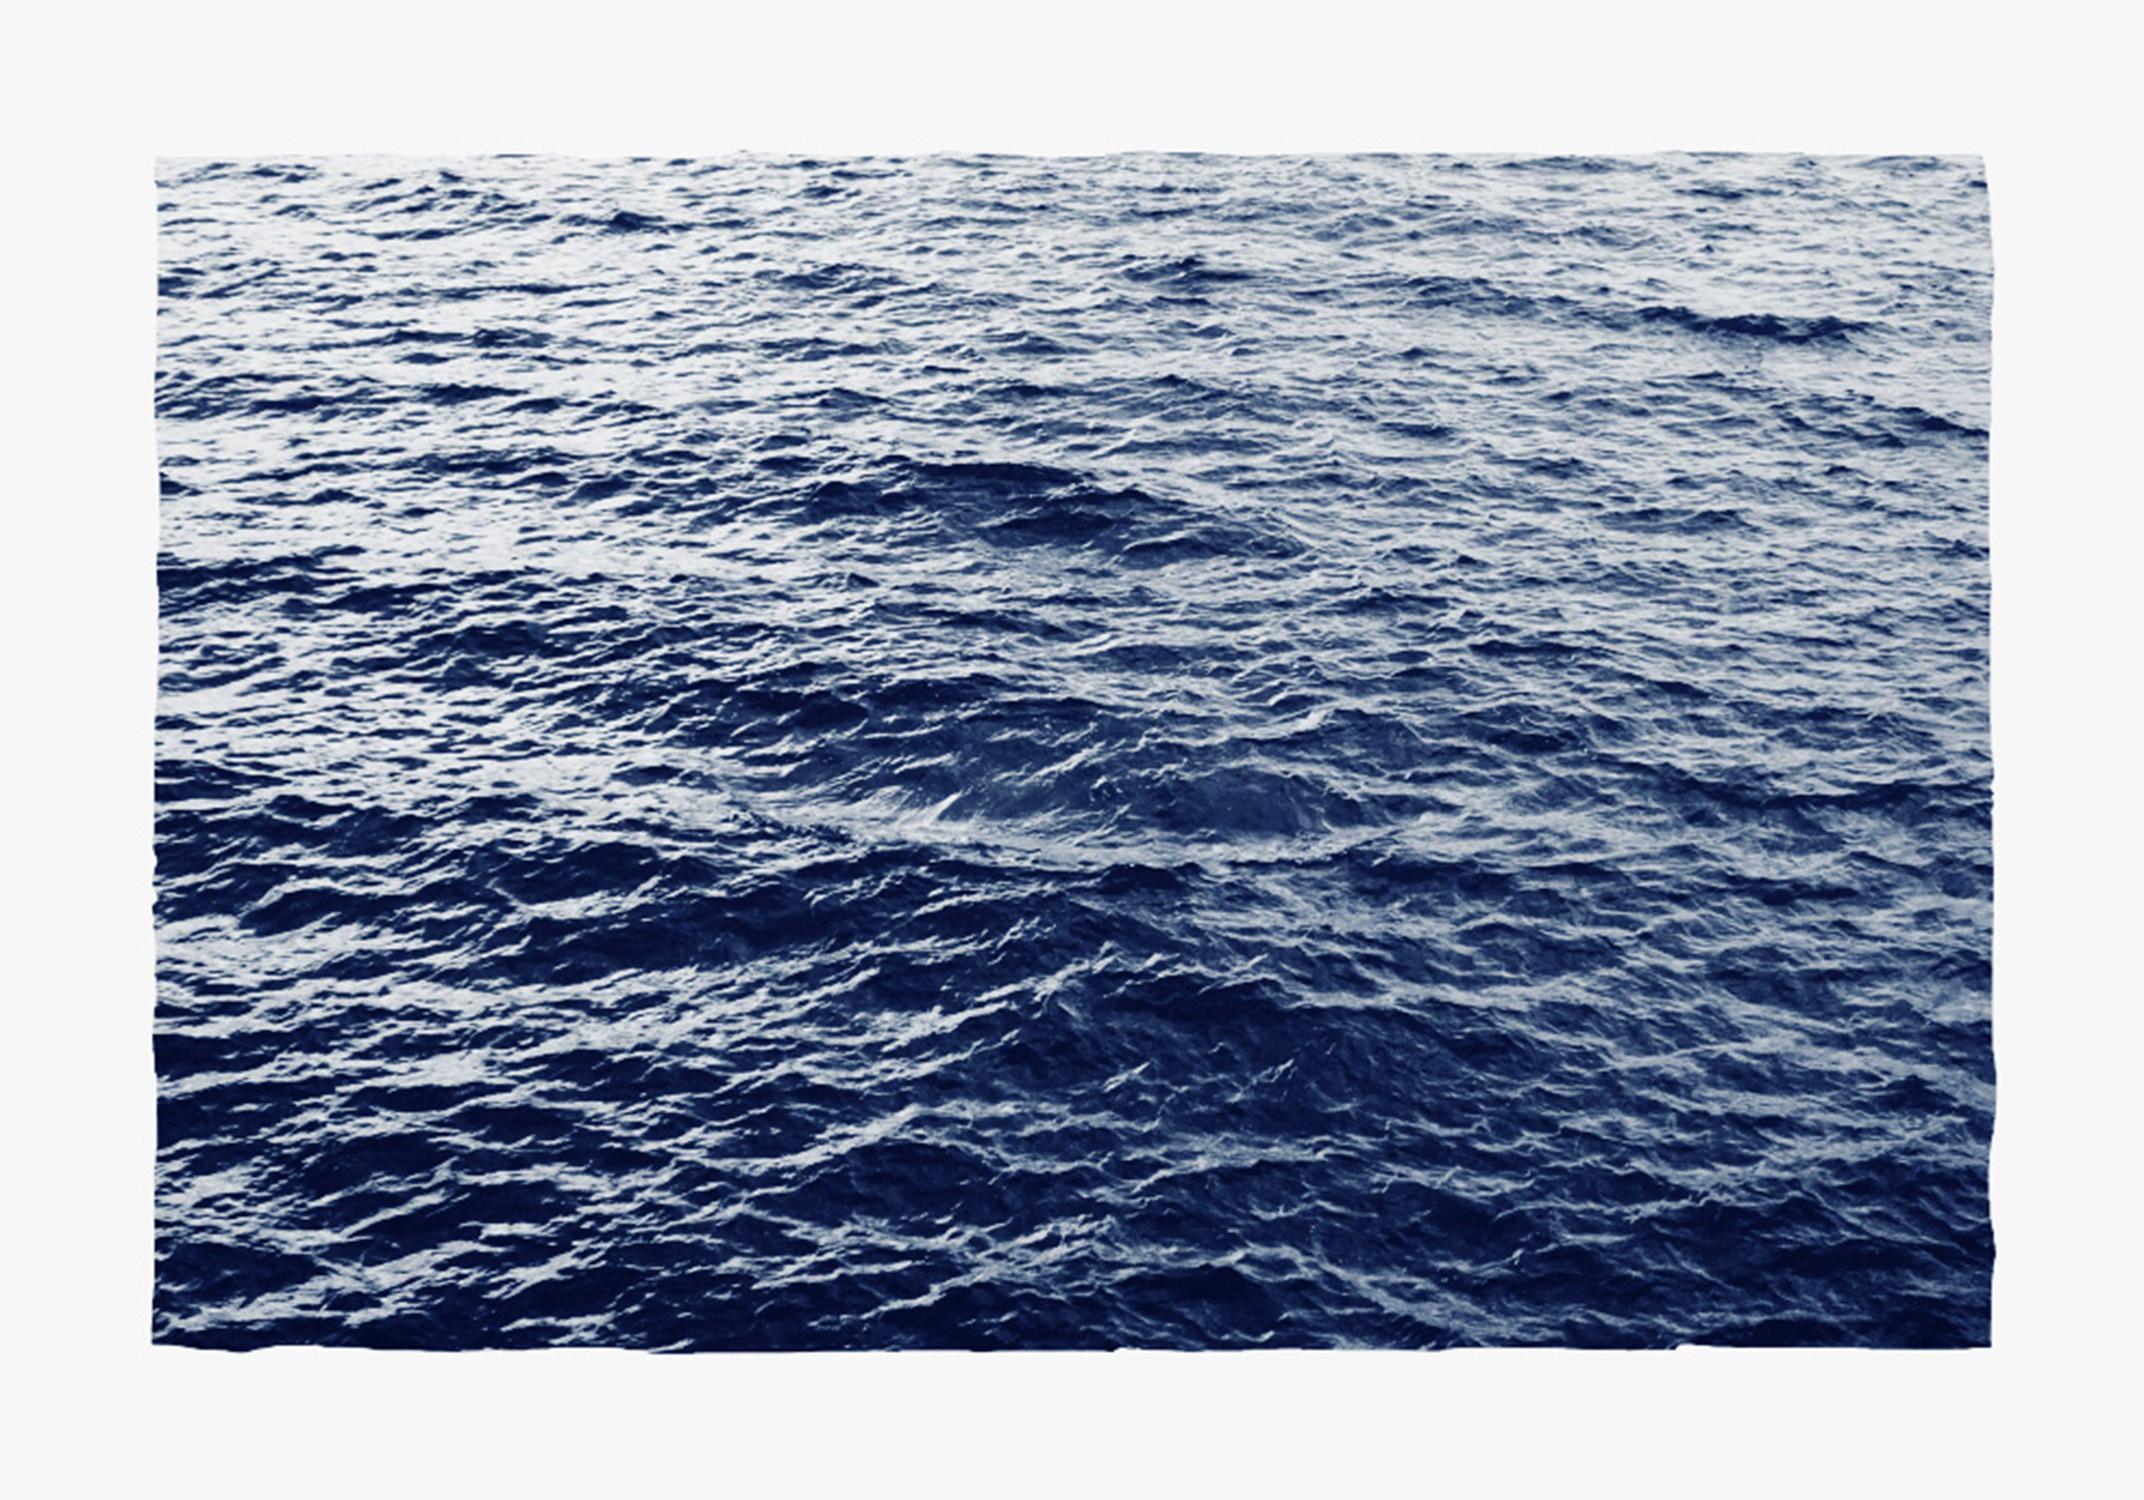 Boundless Ocean Waves, Handmade Classic Blue Sunprint, Limited Edition of 50